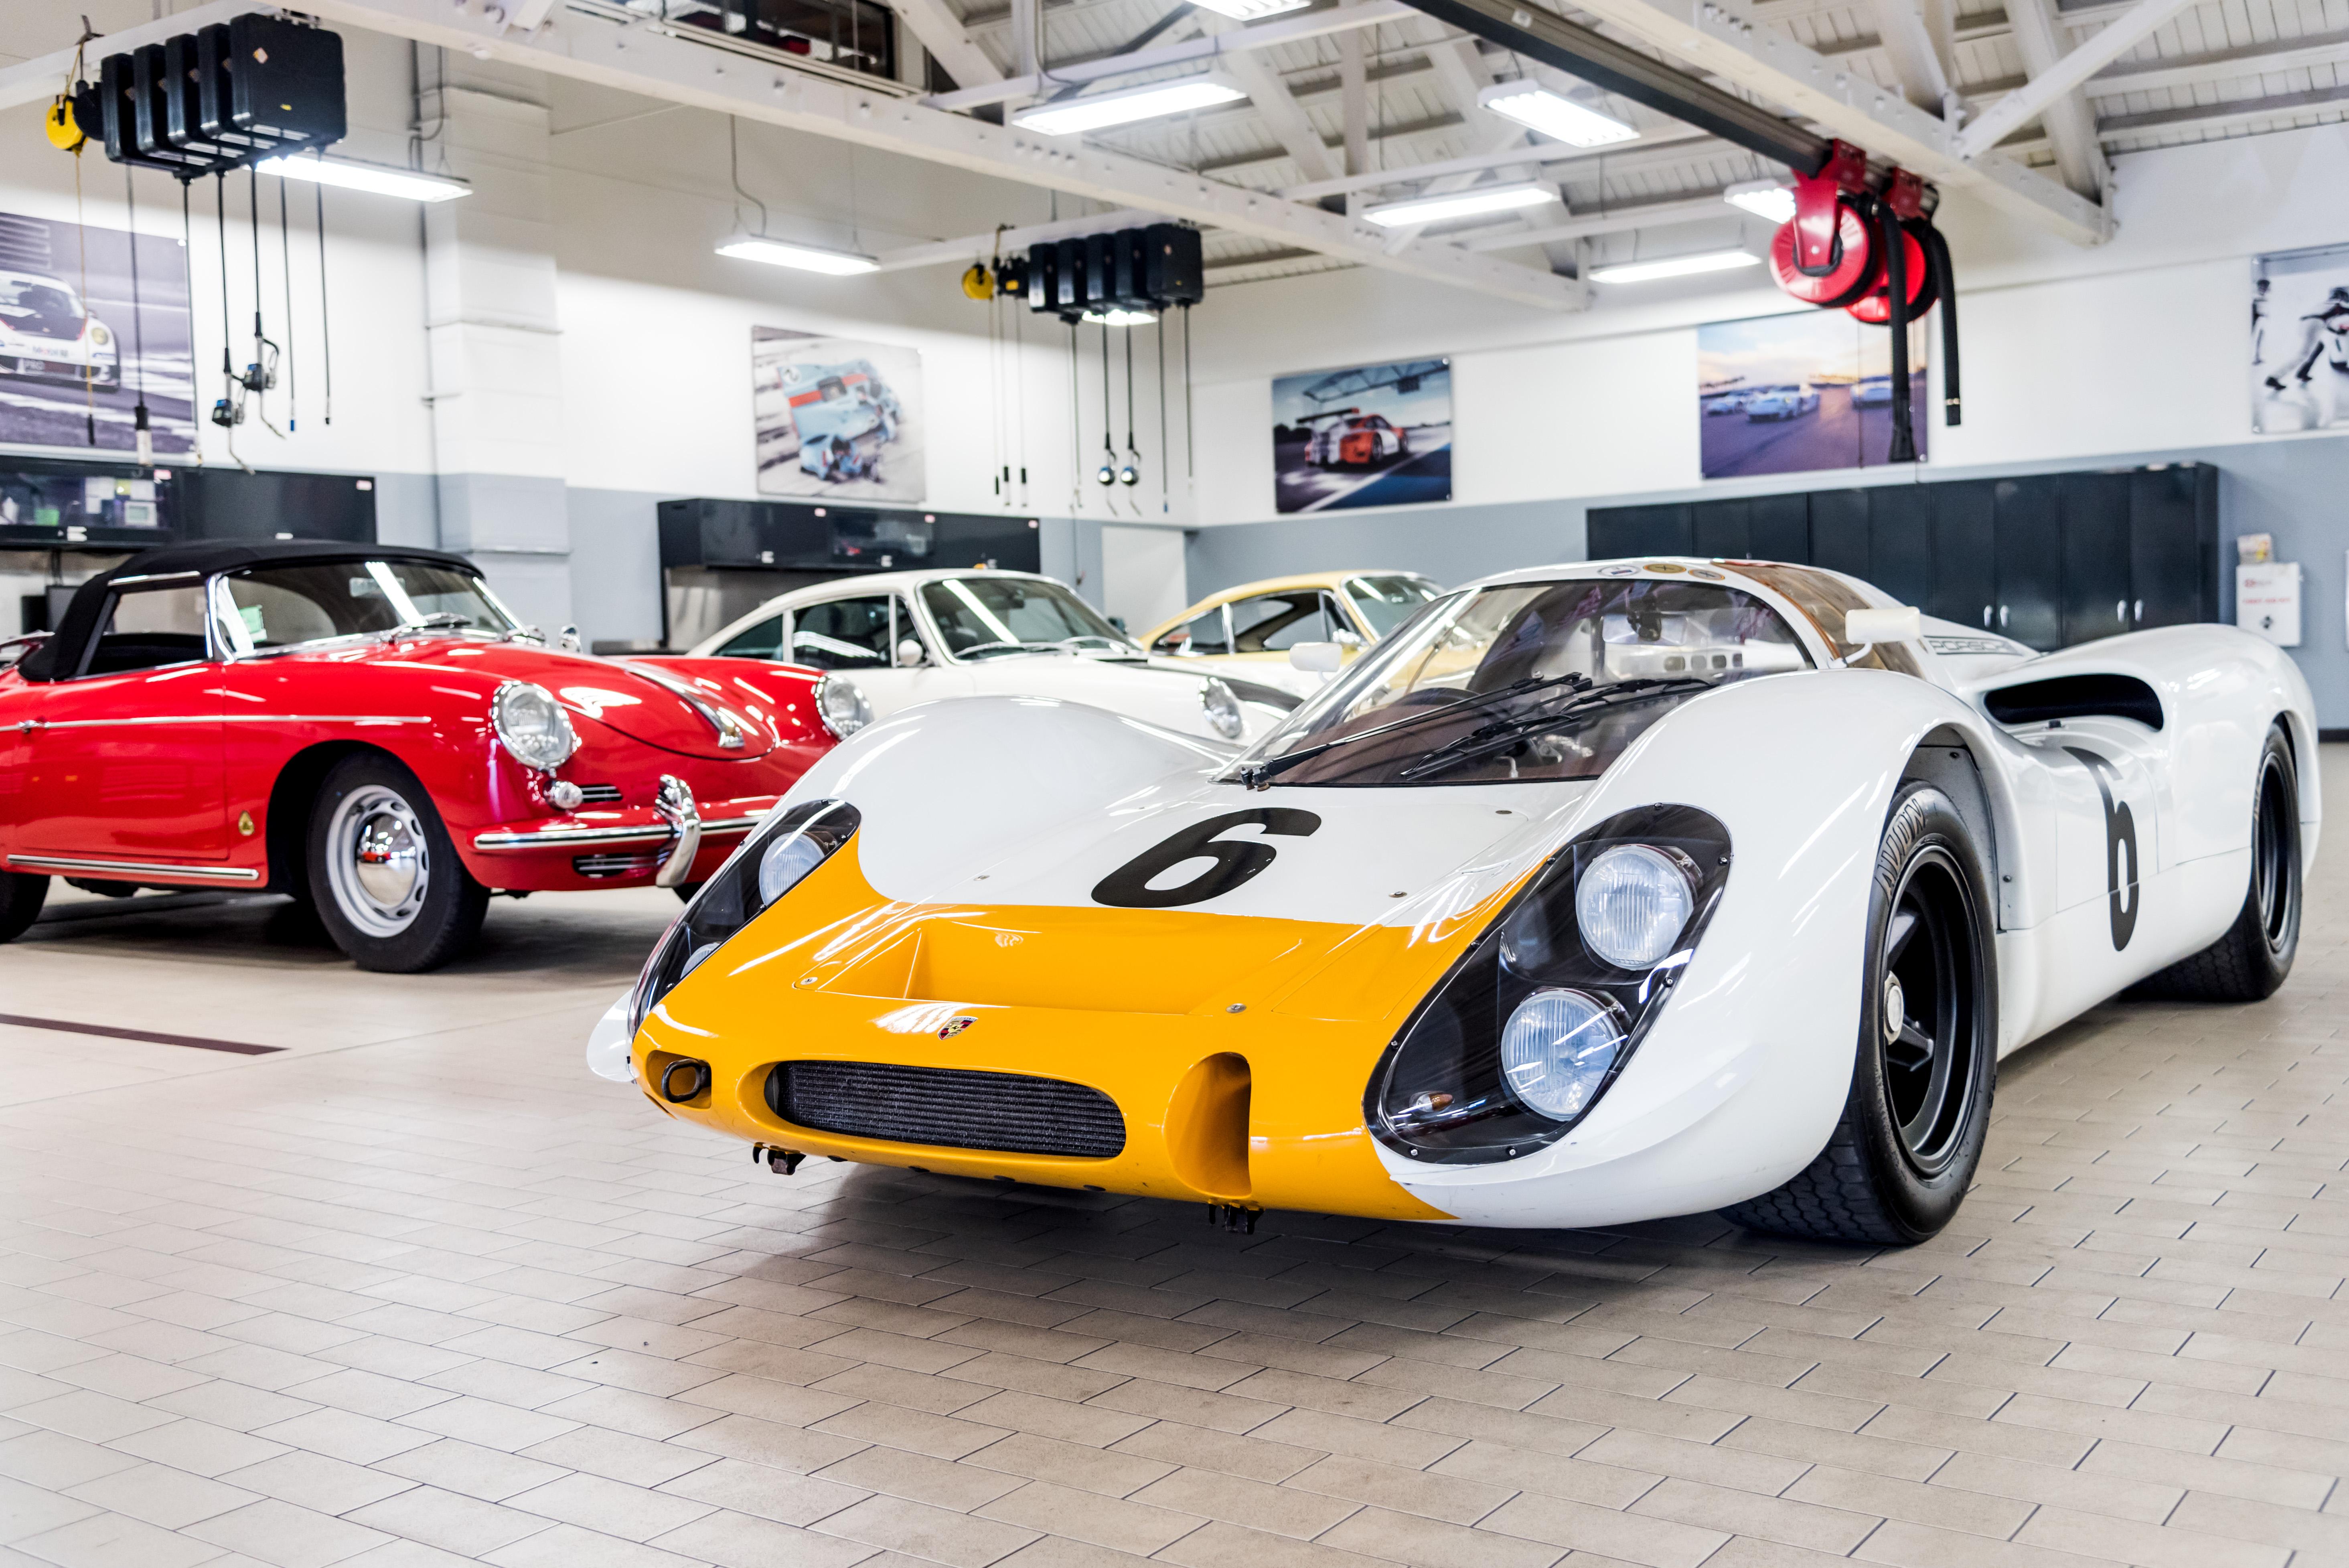 Rusnak Porsche Westlake >> Rusnak/Pasadena Porsche Celebrates Porsche's 70th Anniversary - Rusnak Events